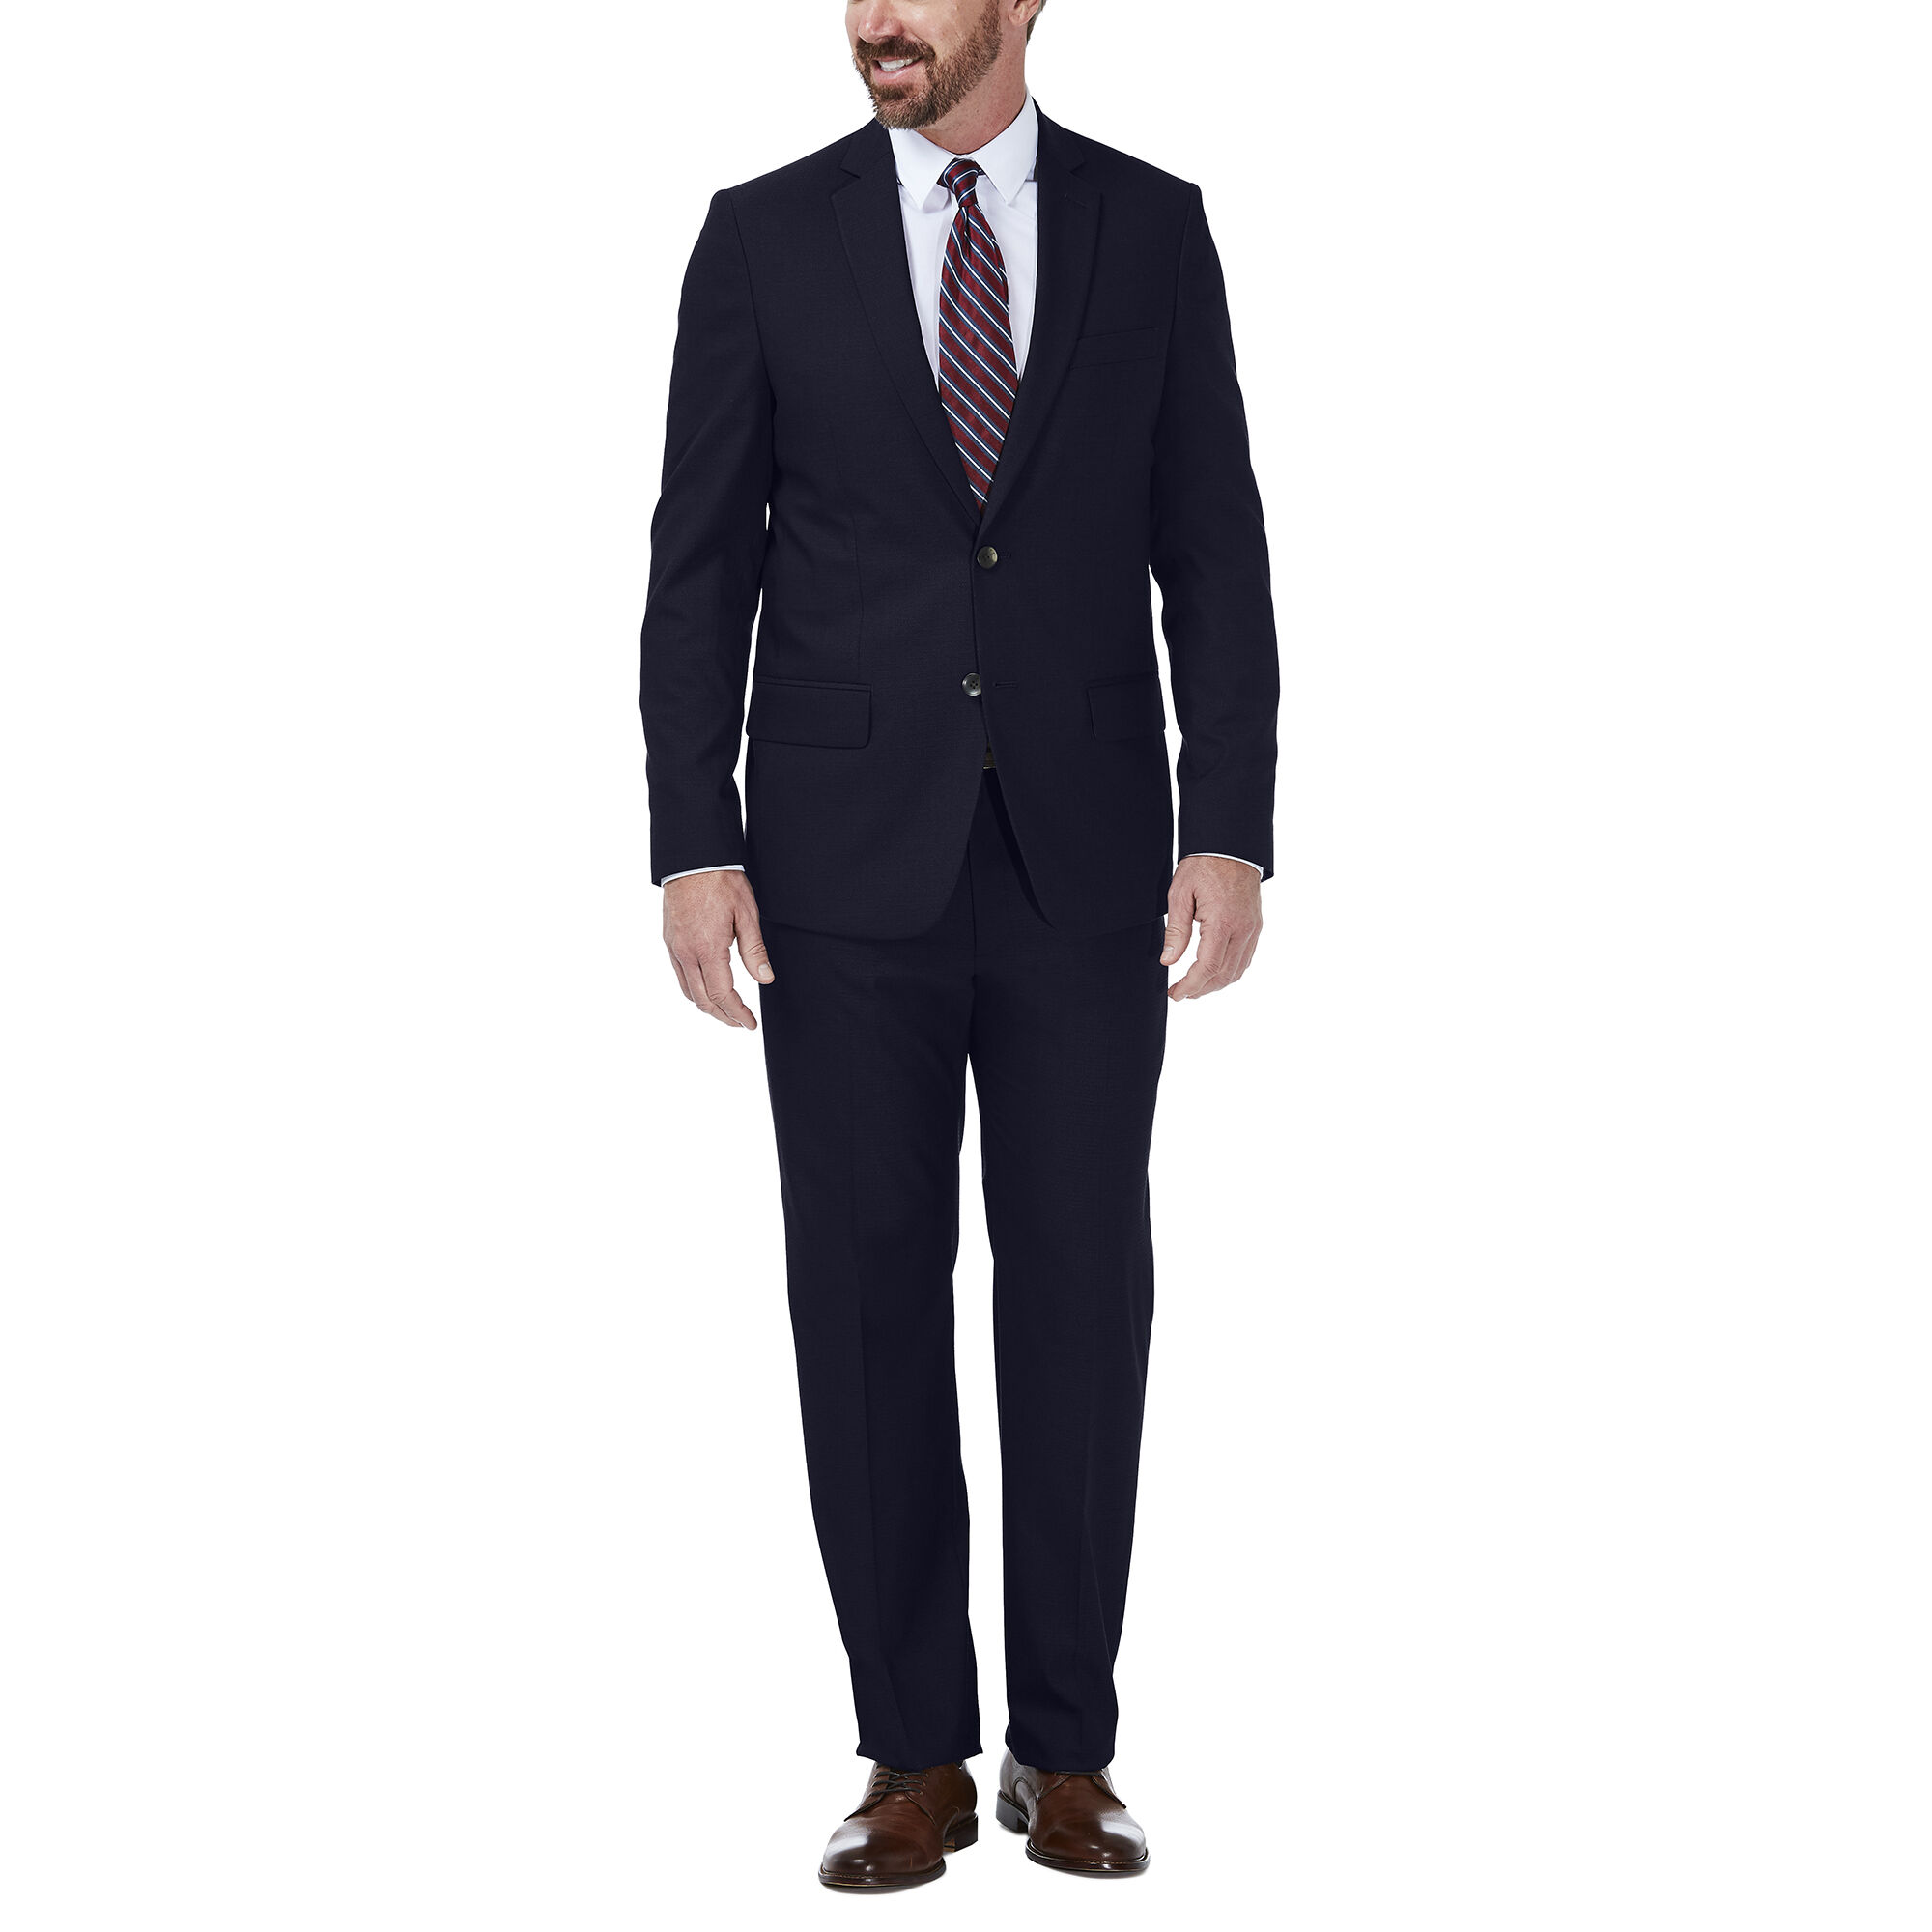 J.M. Haggar Dobby Suit Jacket